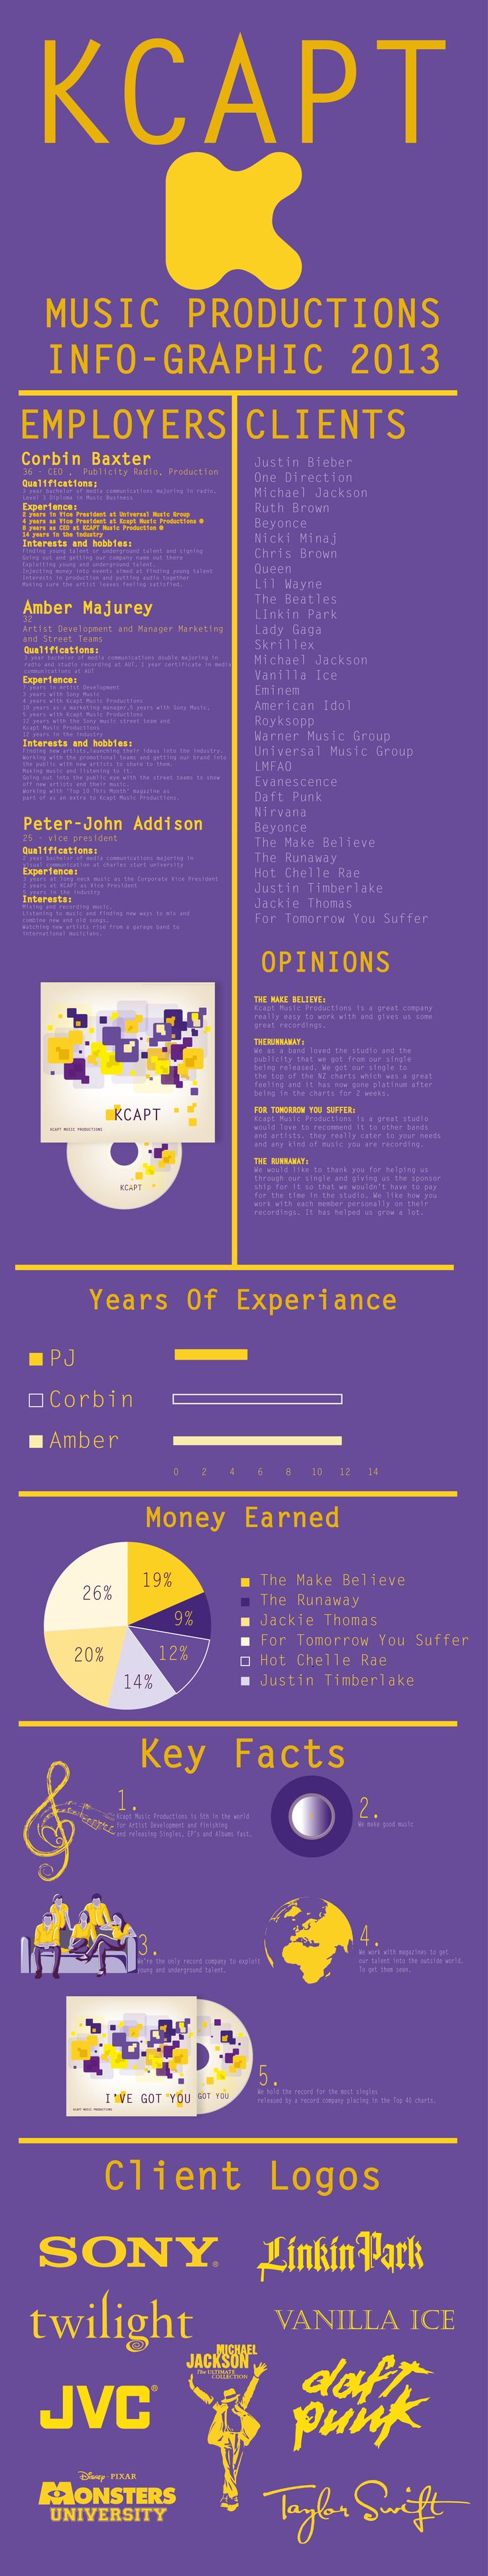 Kcapt Music Productions Info- Graphic Final Design